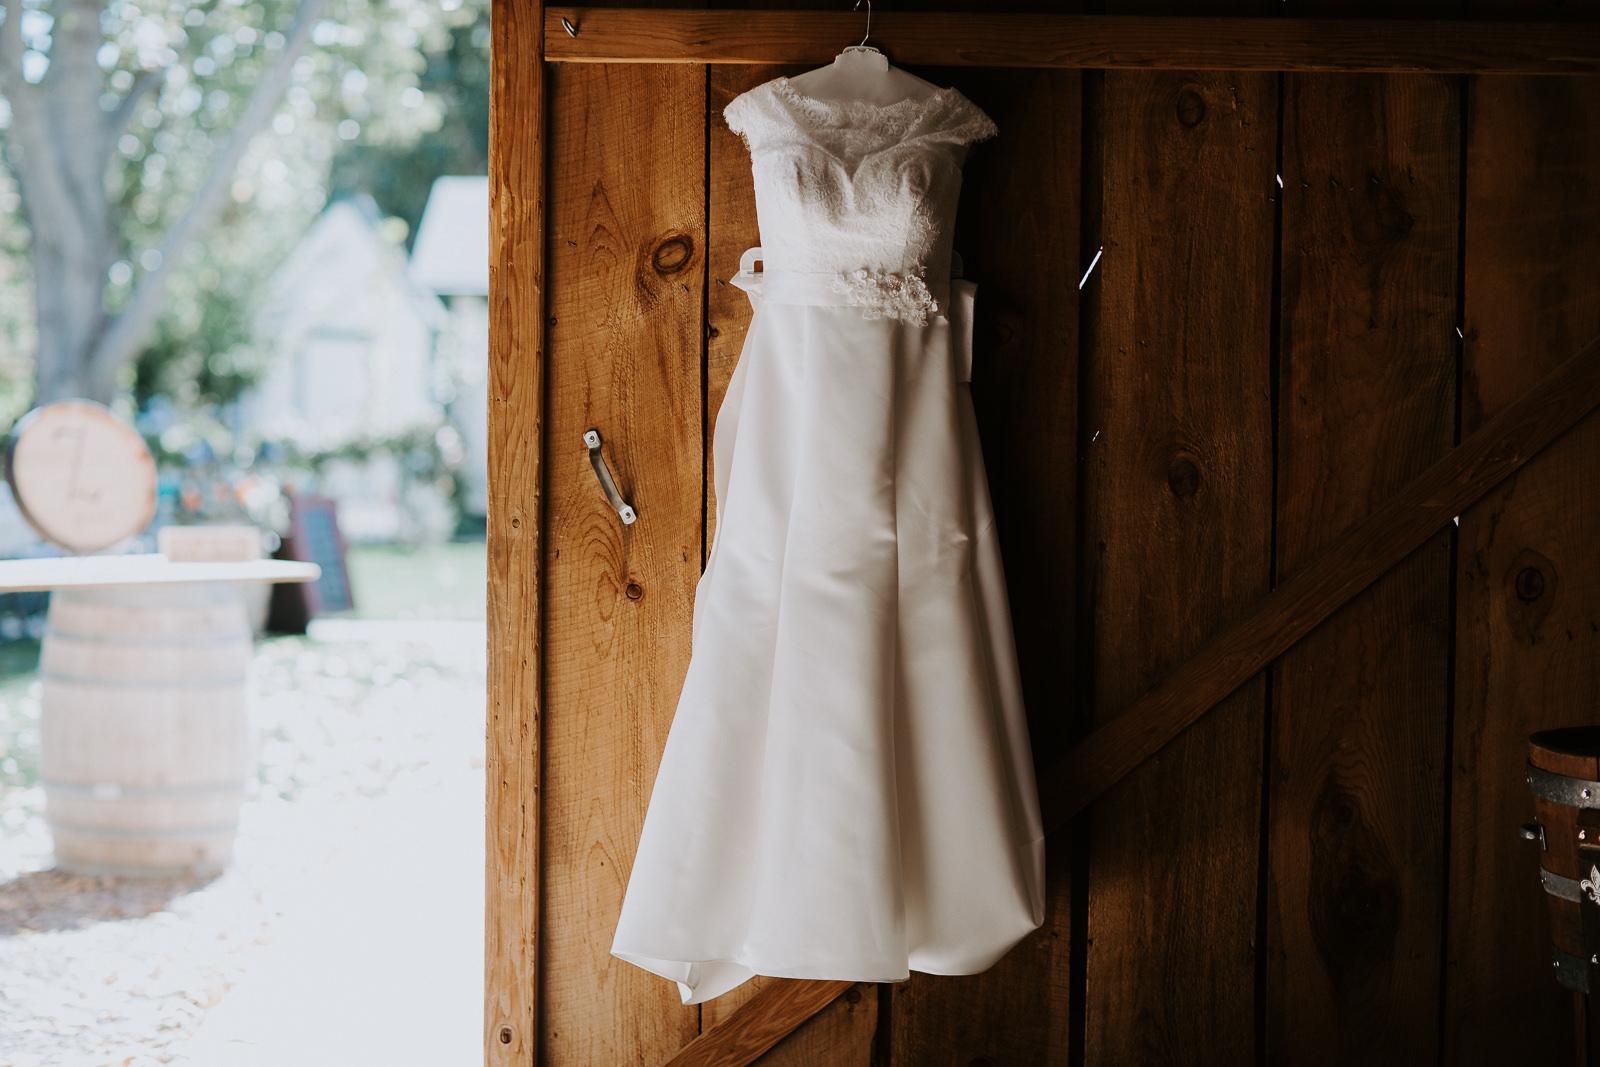 wedding dress wedding details winery barrels shoes flowers signs Palisade Colorado